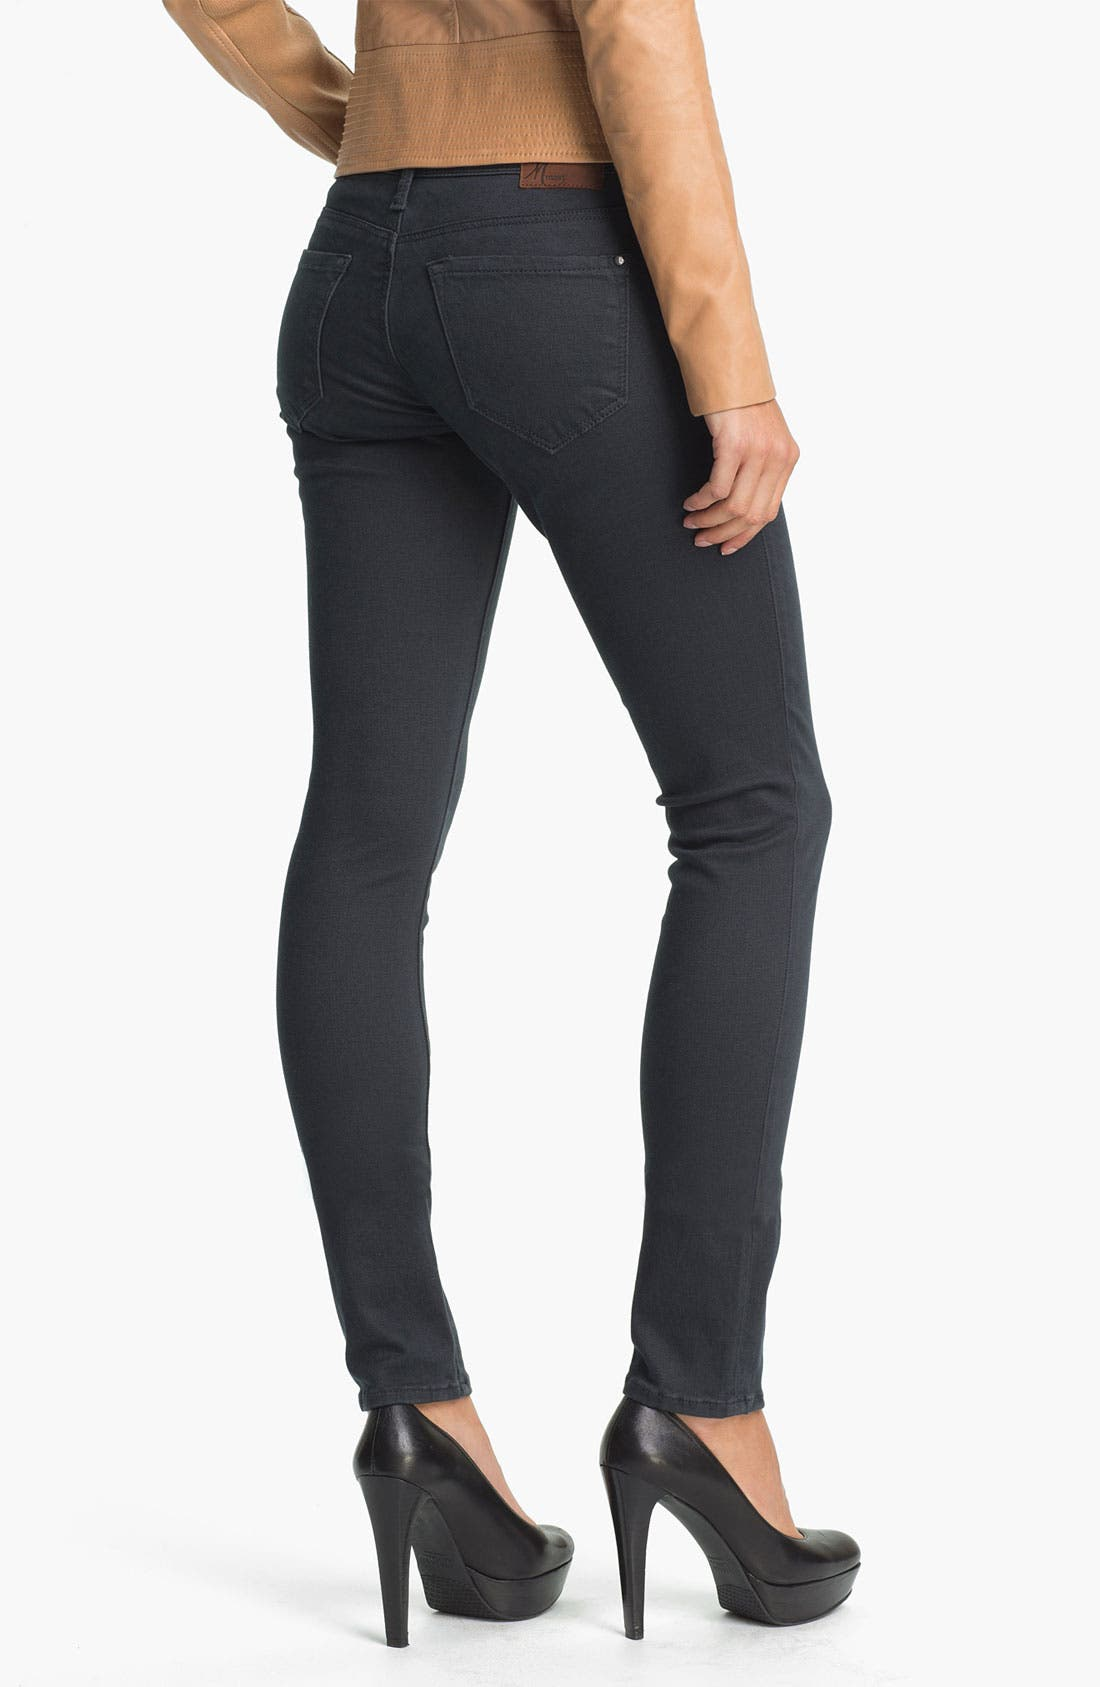 Alternate Image 2  - Mavi Jeans 'Serena' Low Rise Skinny  Jeans (Sueded Granite) (Online Exclusive)